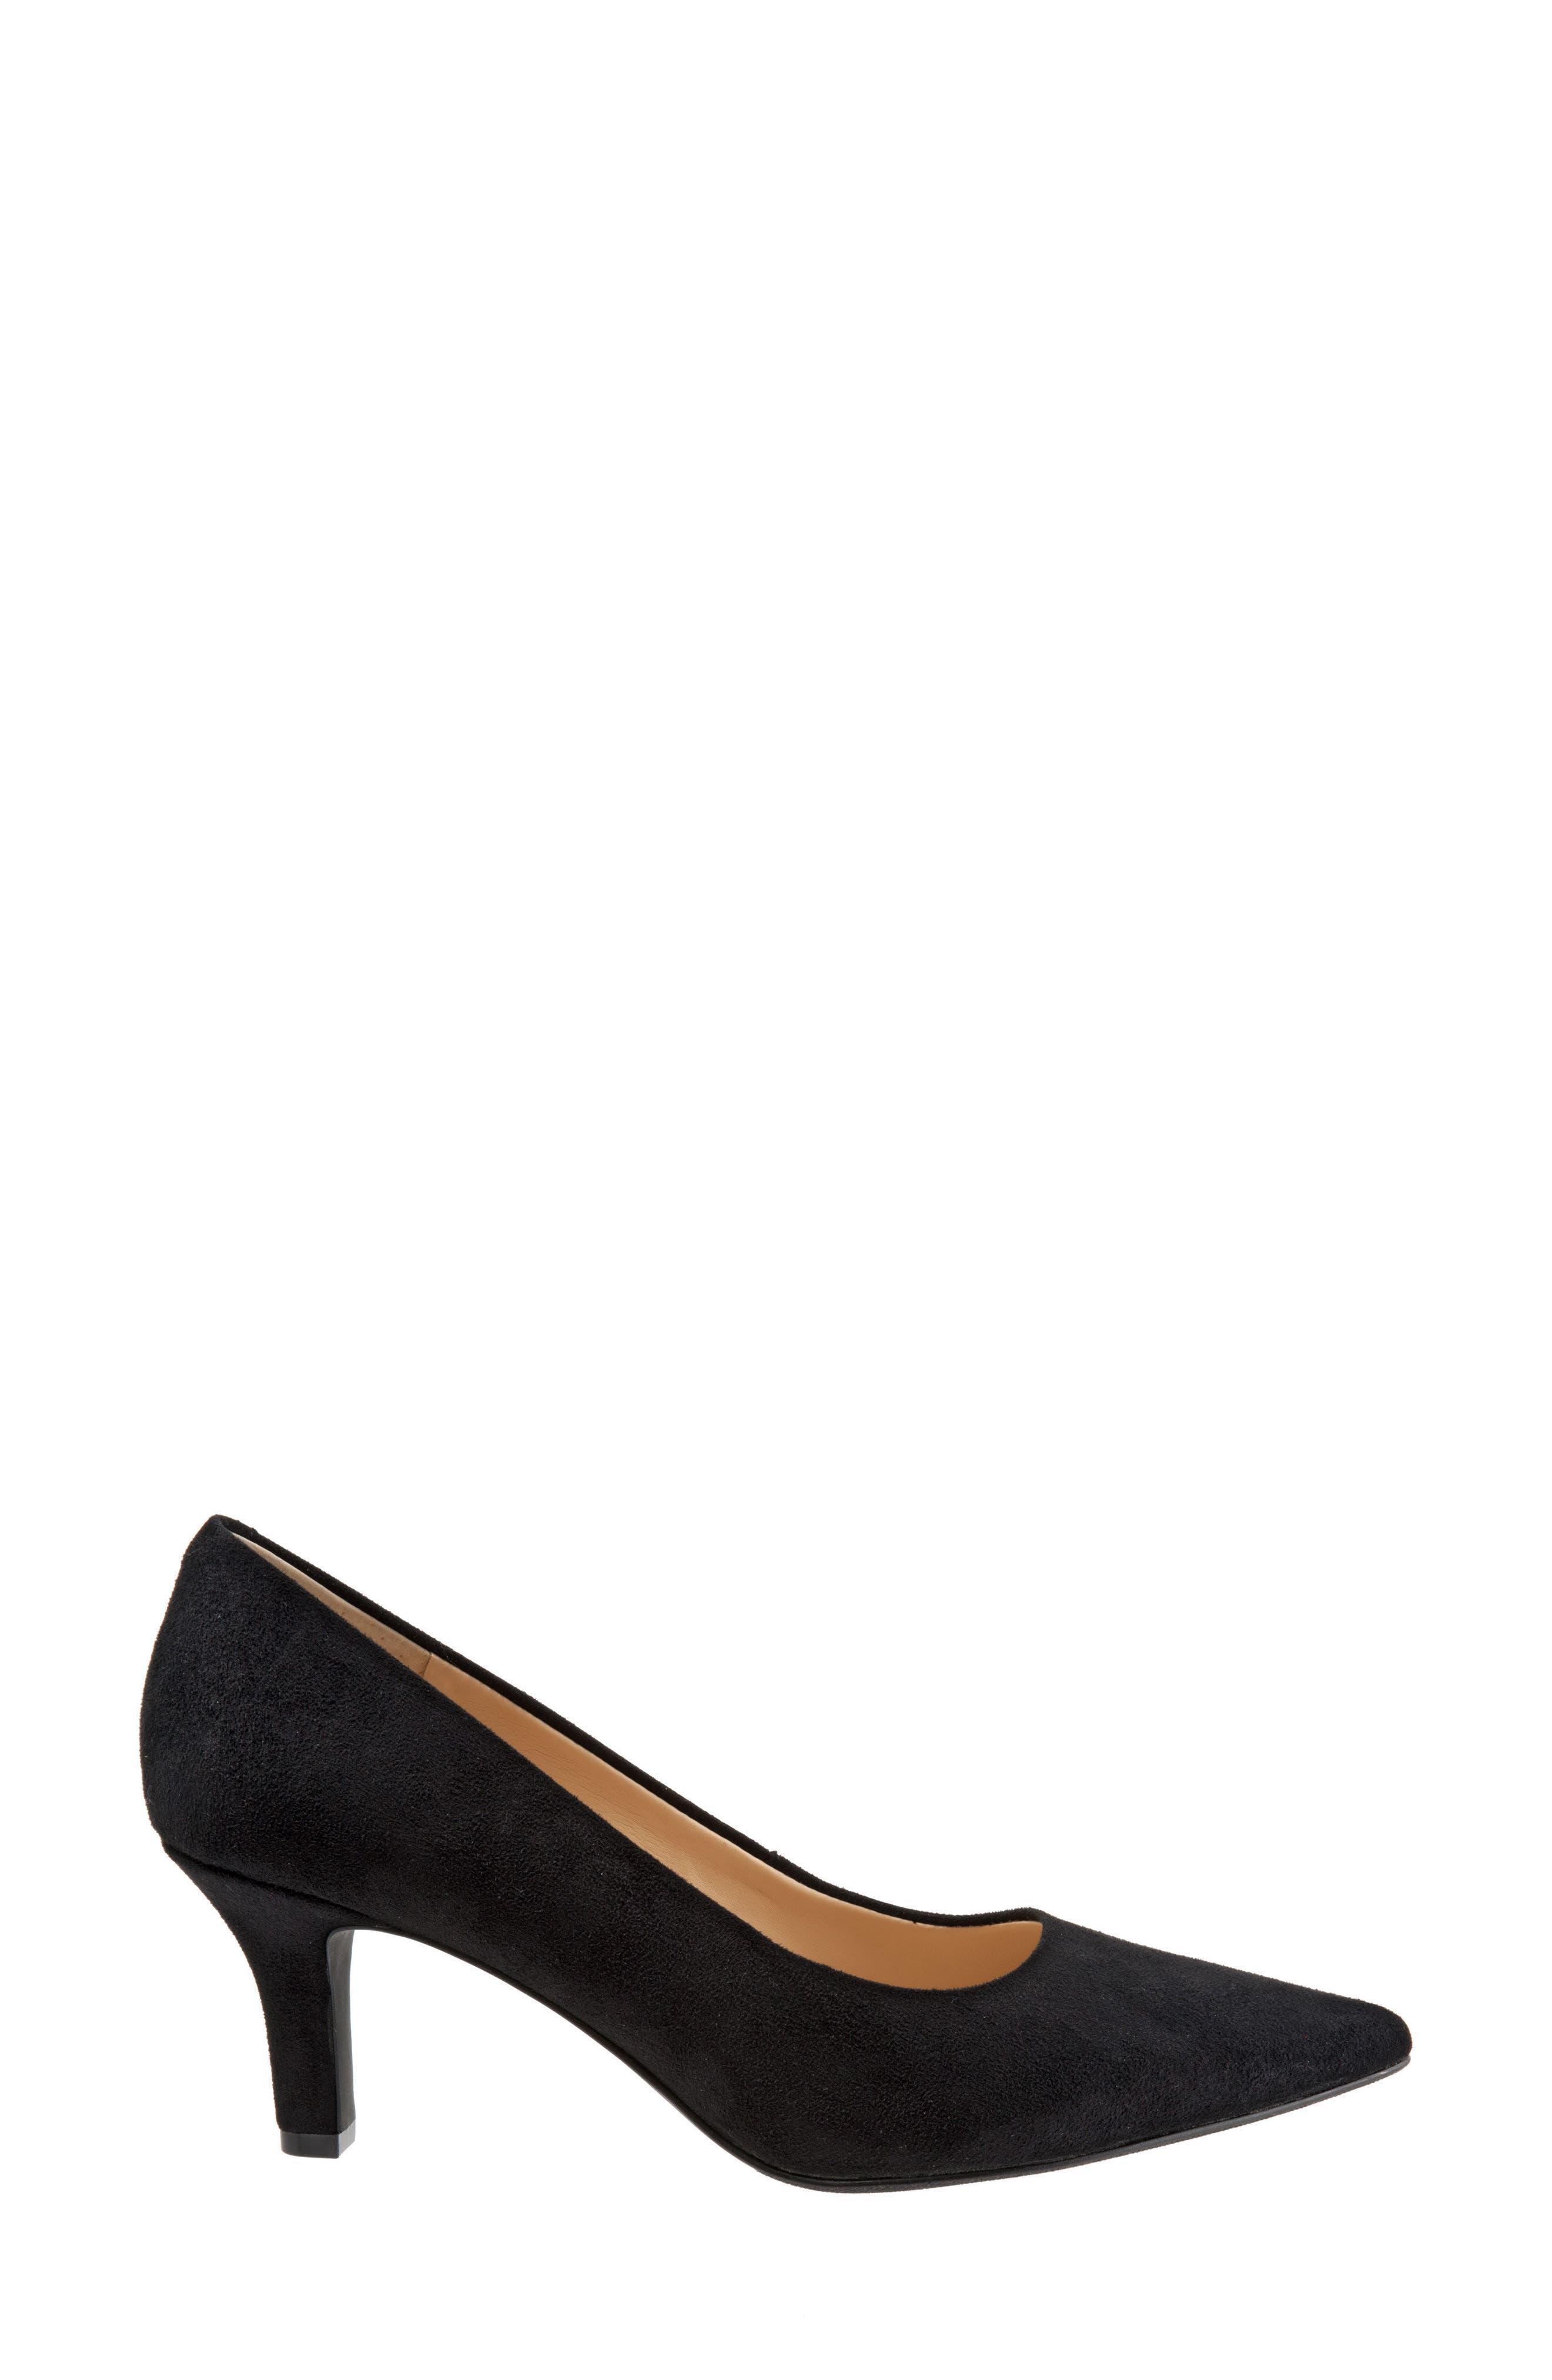 Noelle Pointy Toe Pump,                             Alternate thumbnail 3, color,                             Black Fabric